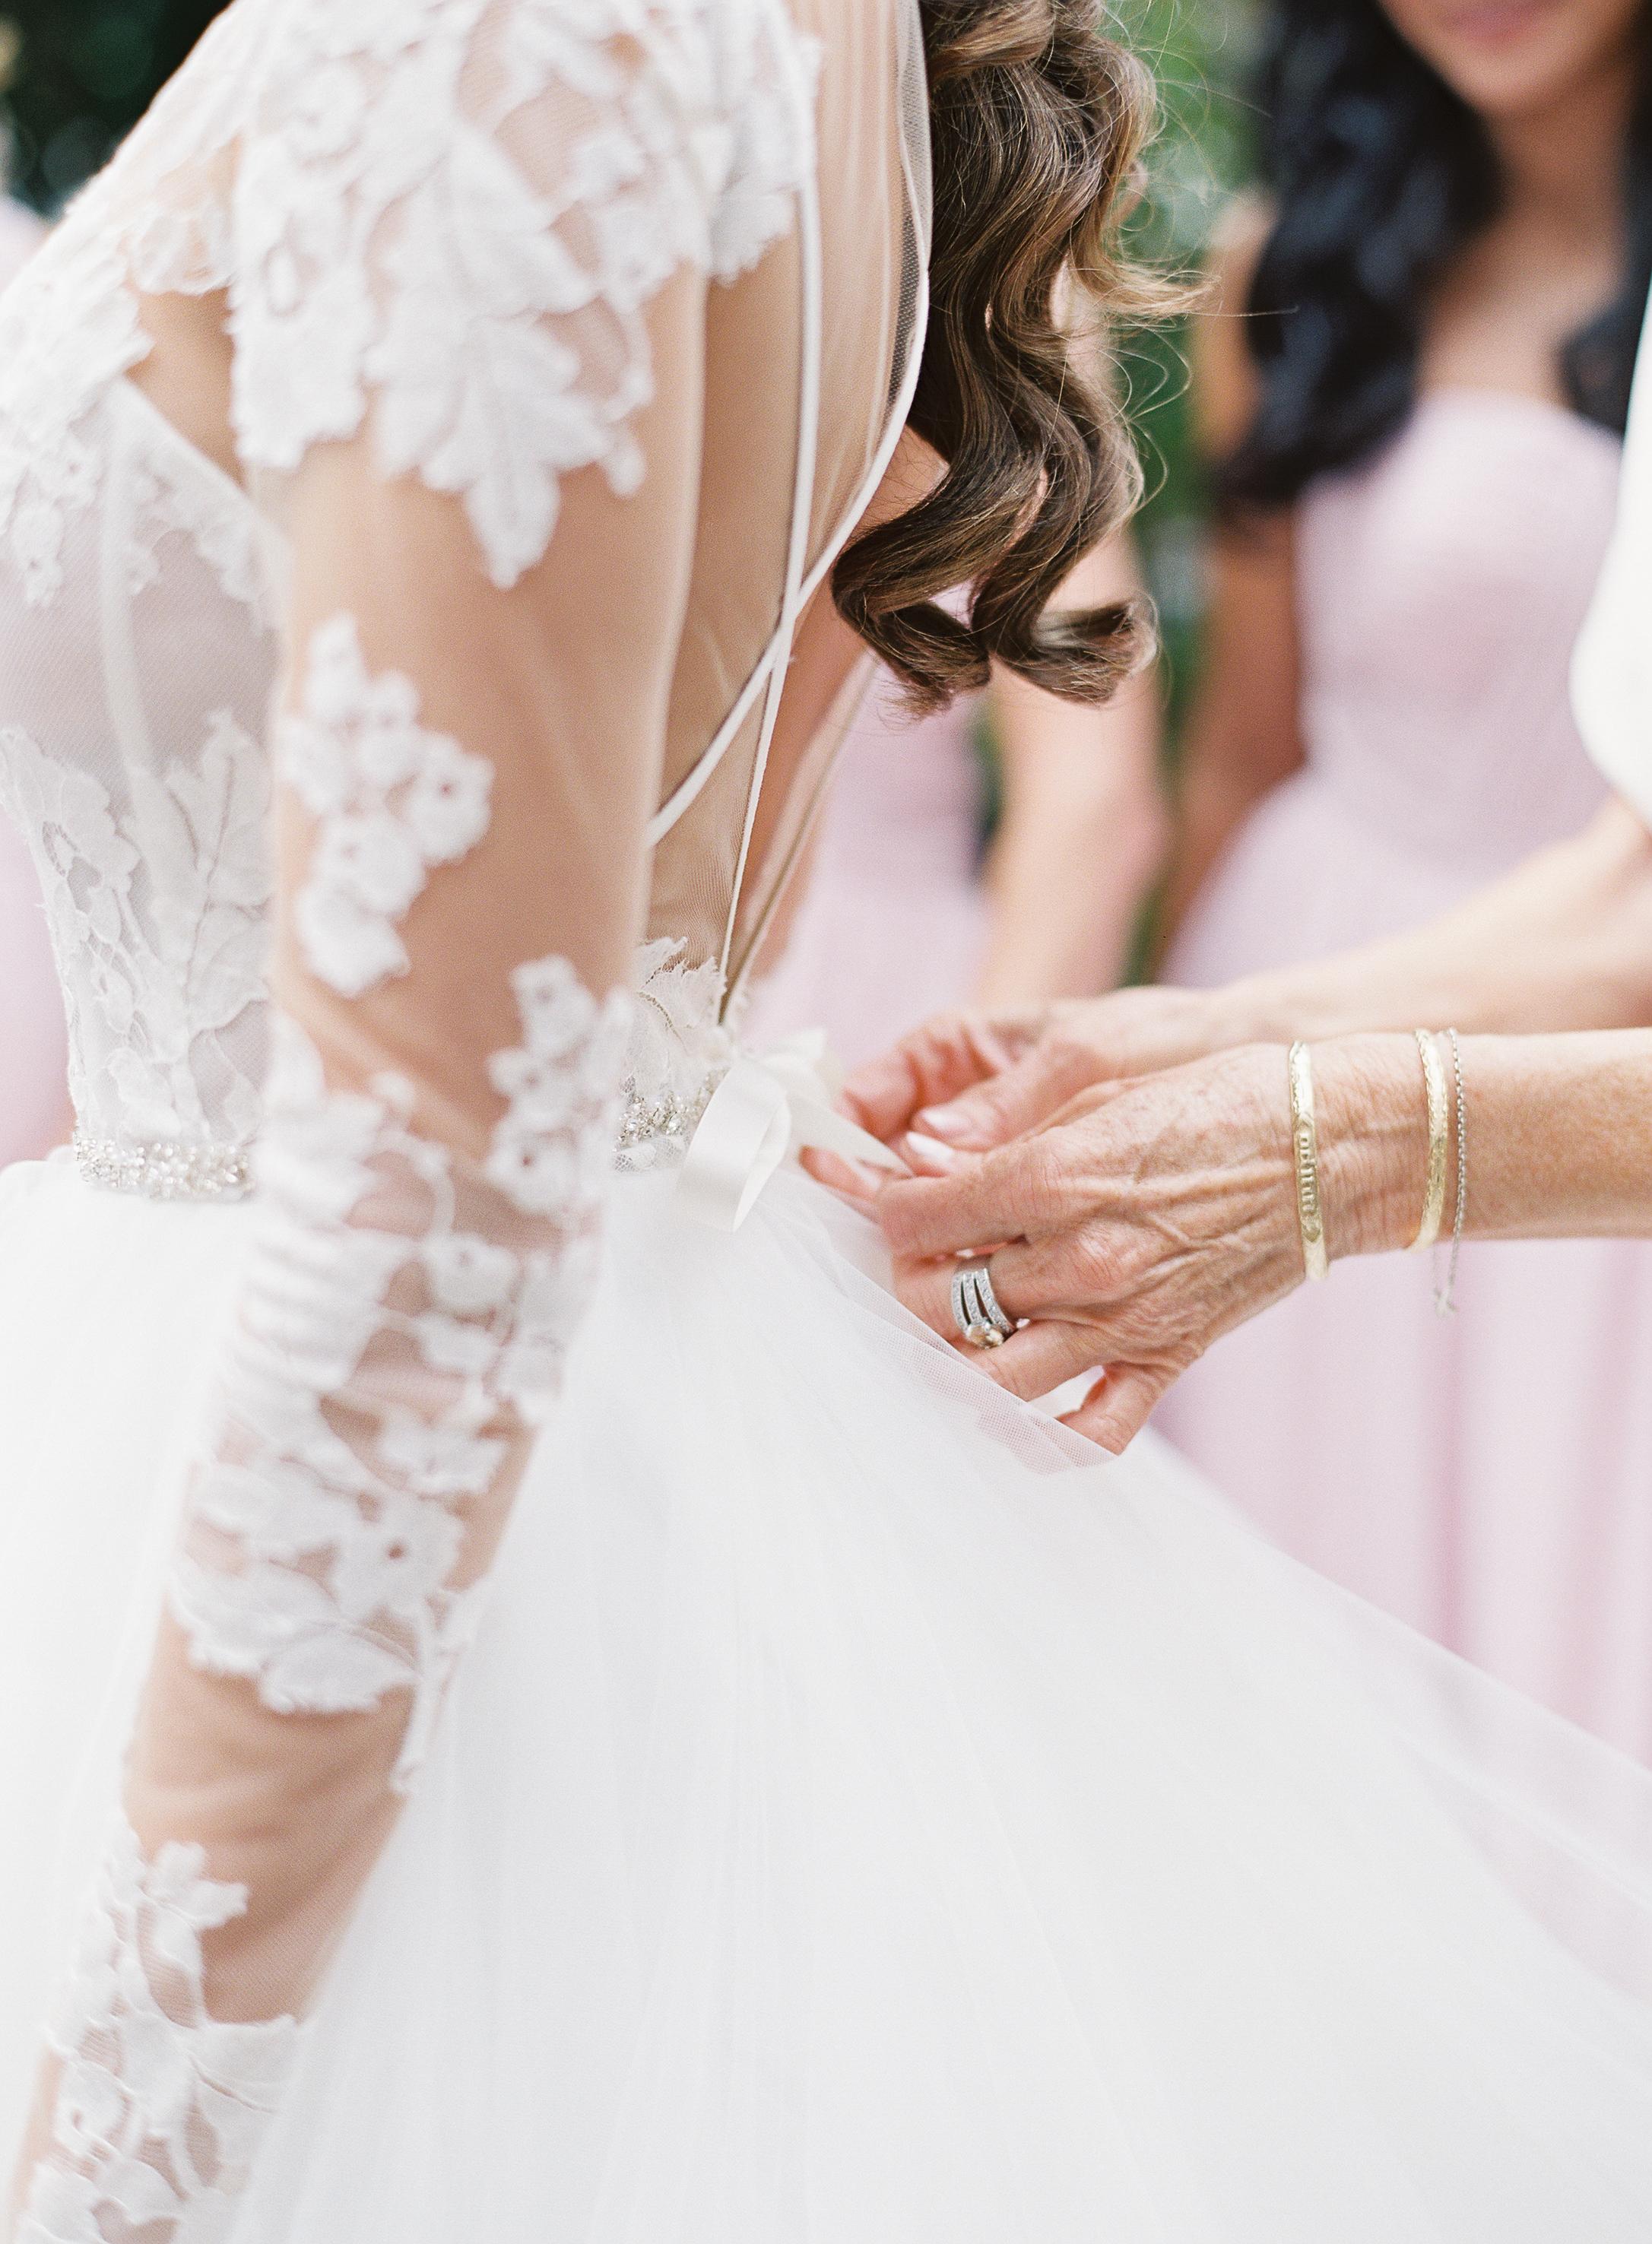 Meghan Mehan Photography   Fine Art Film Wedding Photographer   California   San Francisco   Napa   Sonoma   Santa Barbara   Big Sur   Destination Wedding Photographer 010.jpg